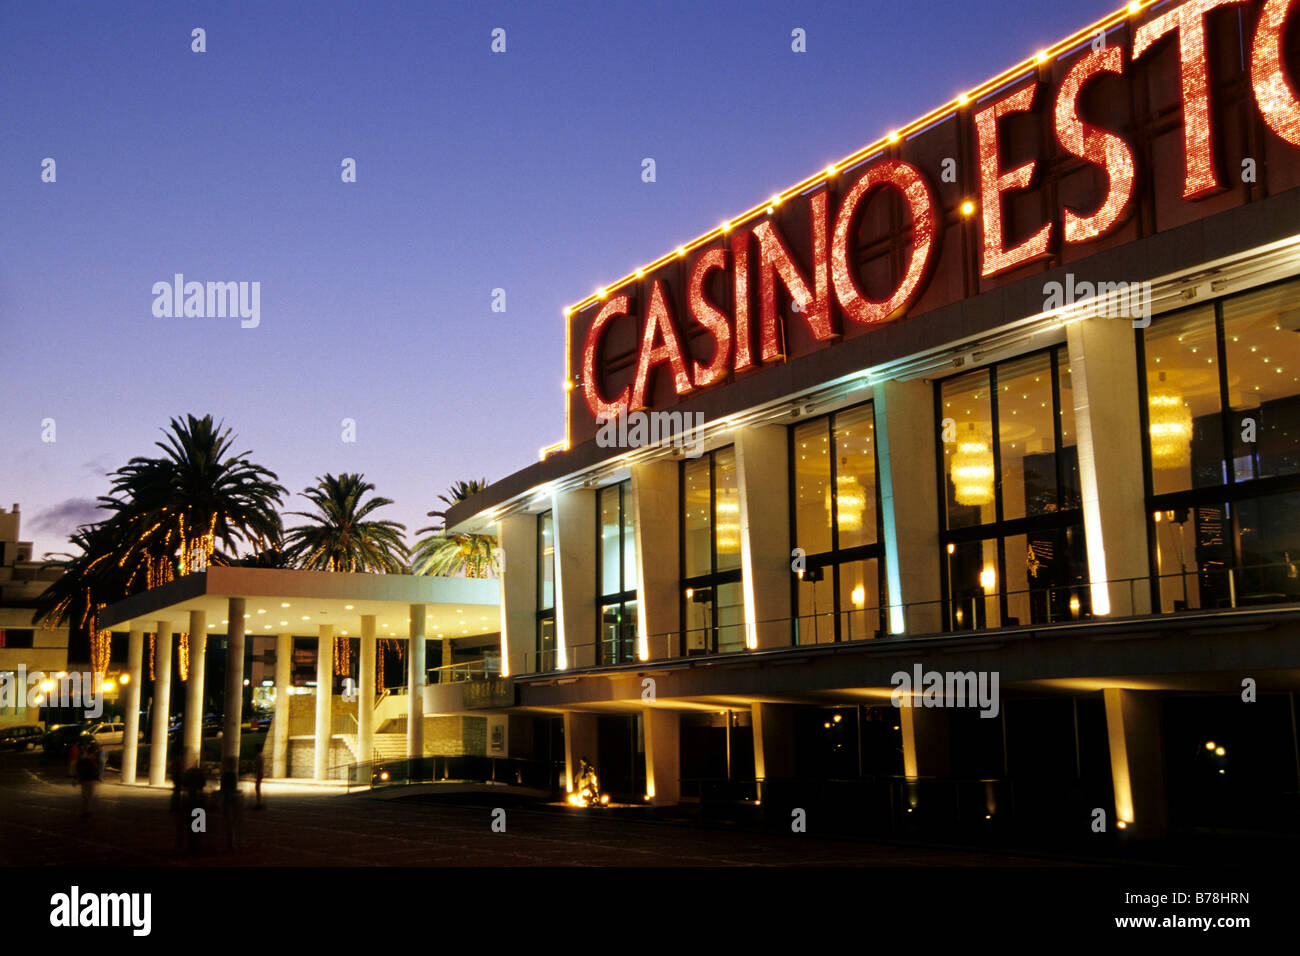 Casino Estoril in the evening, a casino in the tradition of modern architecture. Estoril, a mundane seaside resort - Stock Image